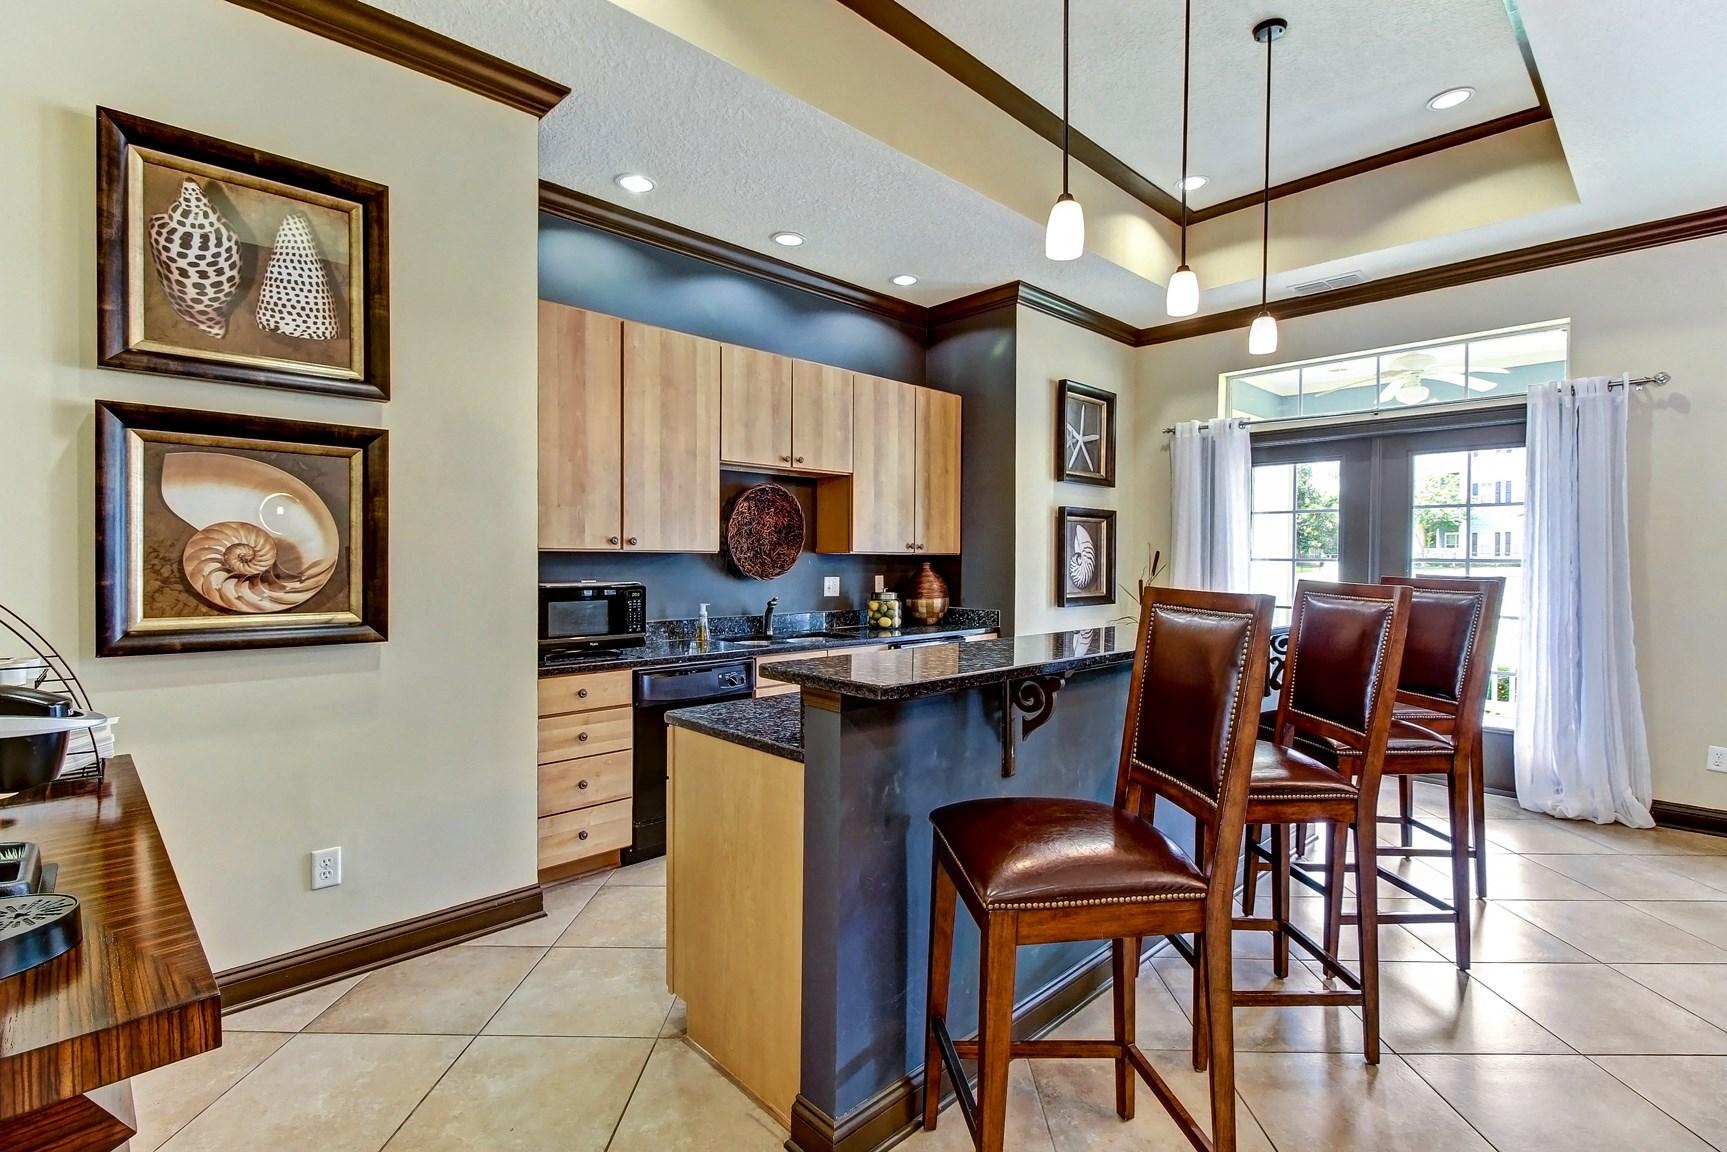 Community Kitchen at Magnolia Village Apartments in Jacksonville, FL